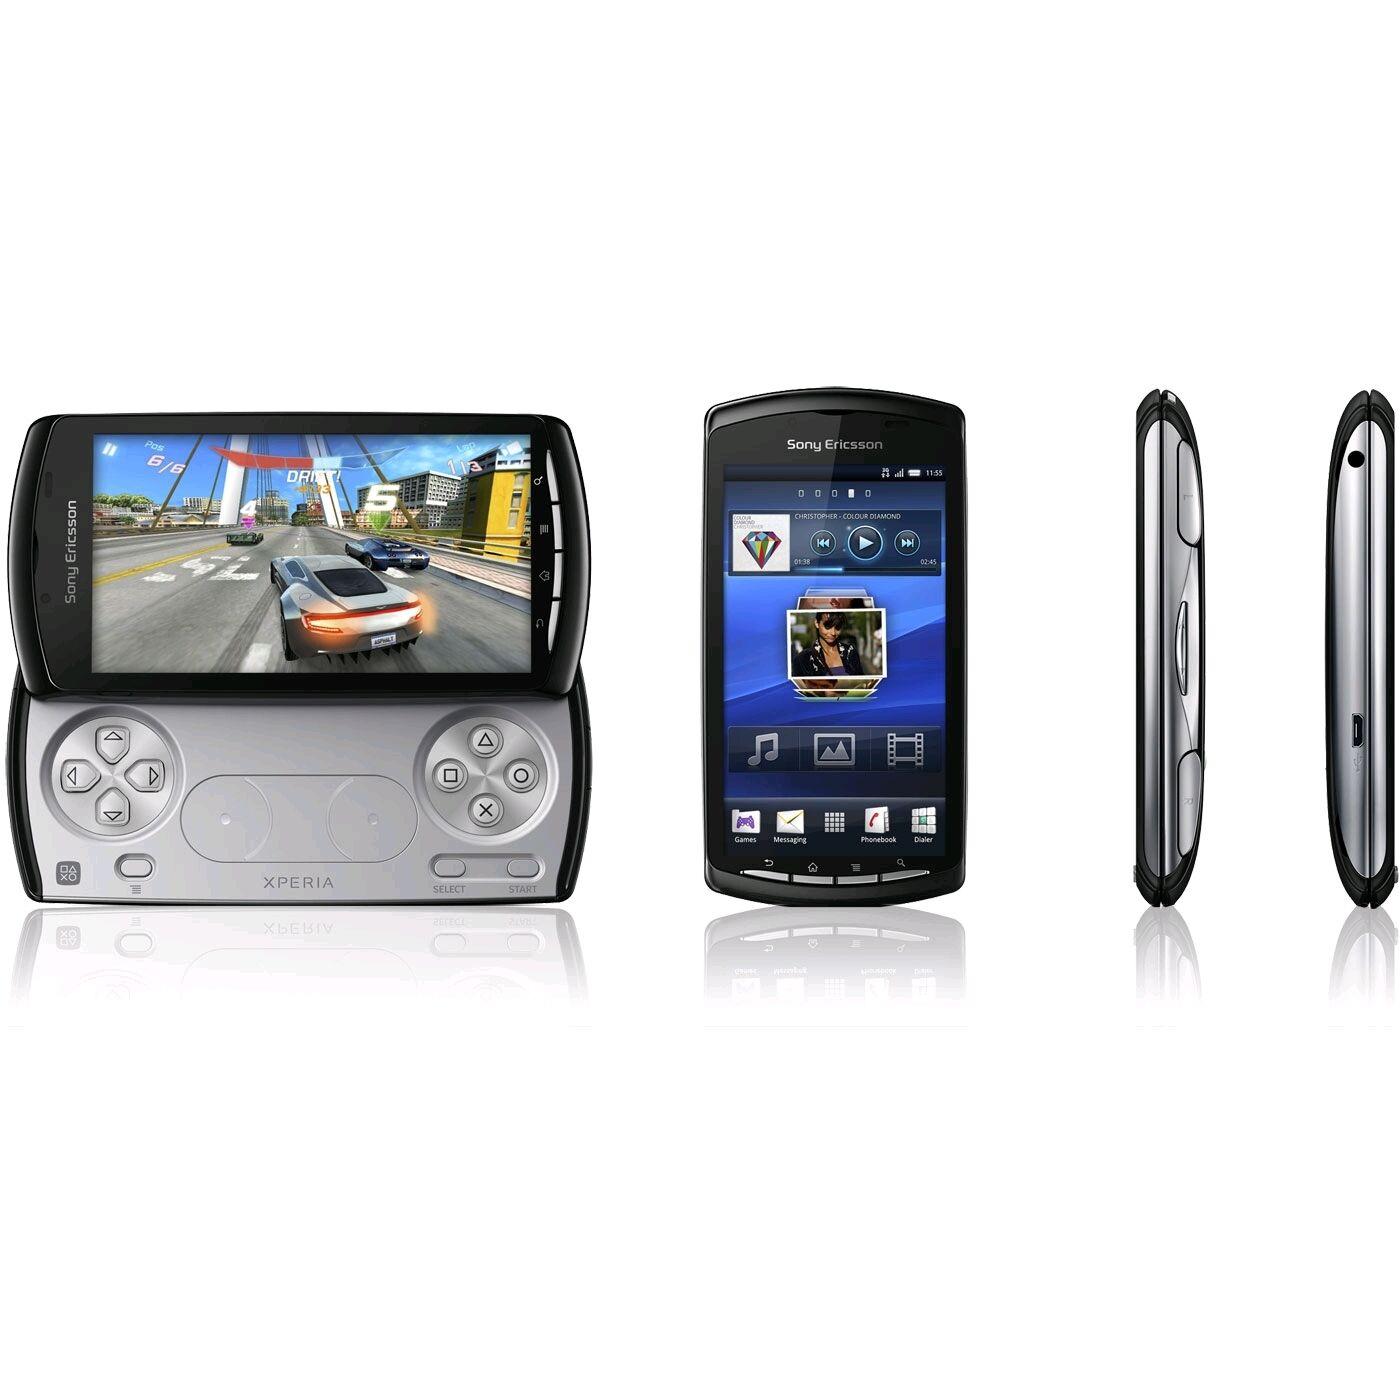 Sony Ericsson Xperia Play R800x Cdma Unlocked(sprint And Verizon Wireless)  How To Delete Search History